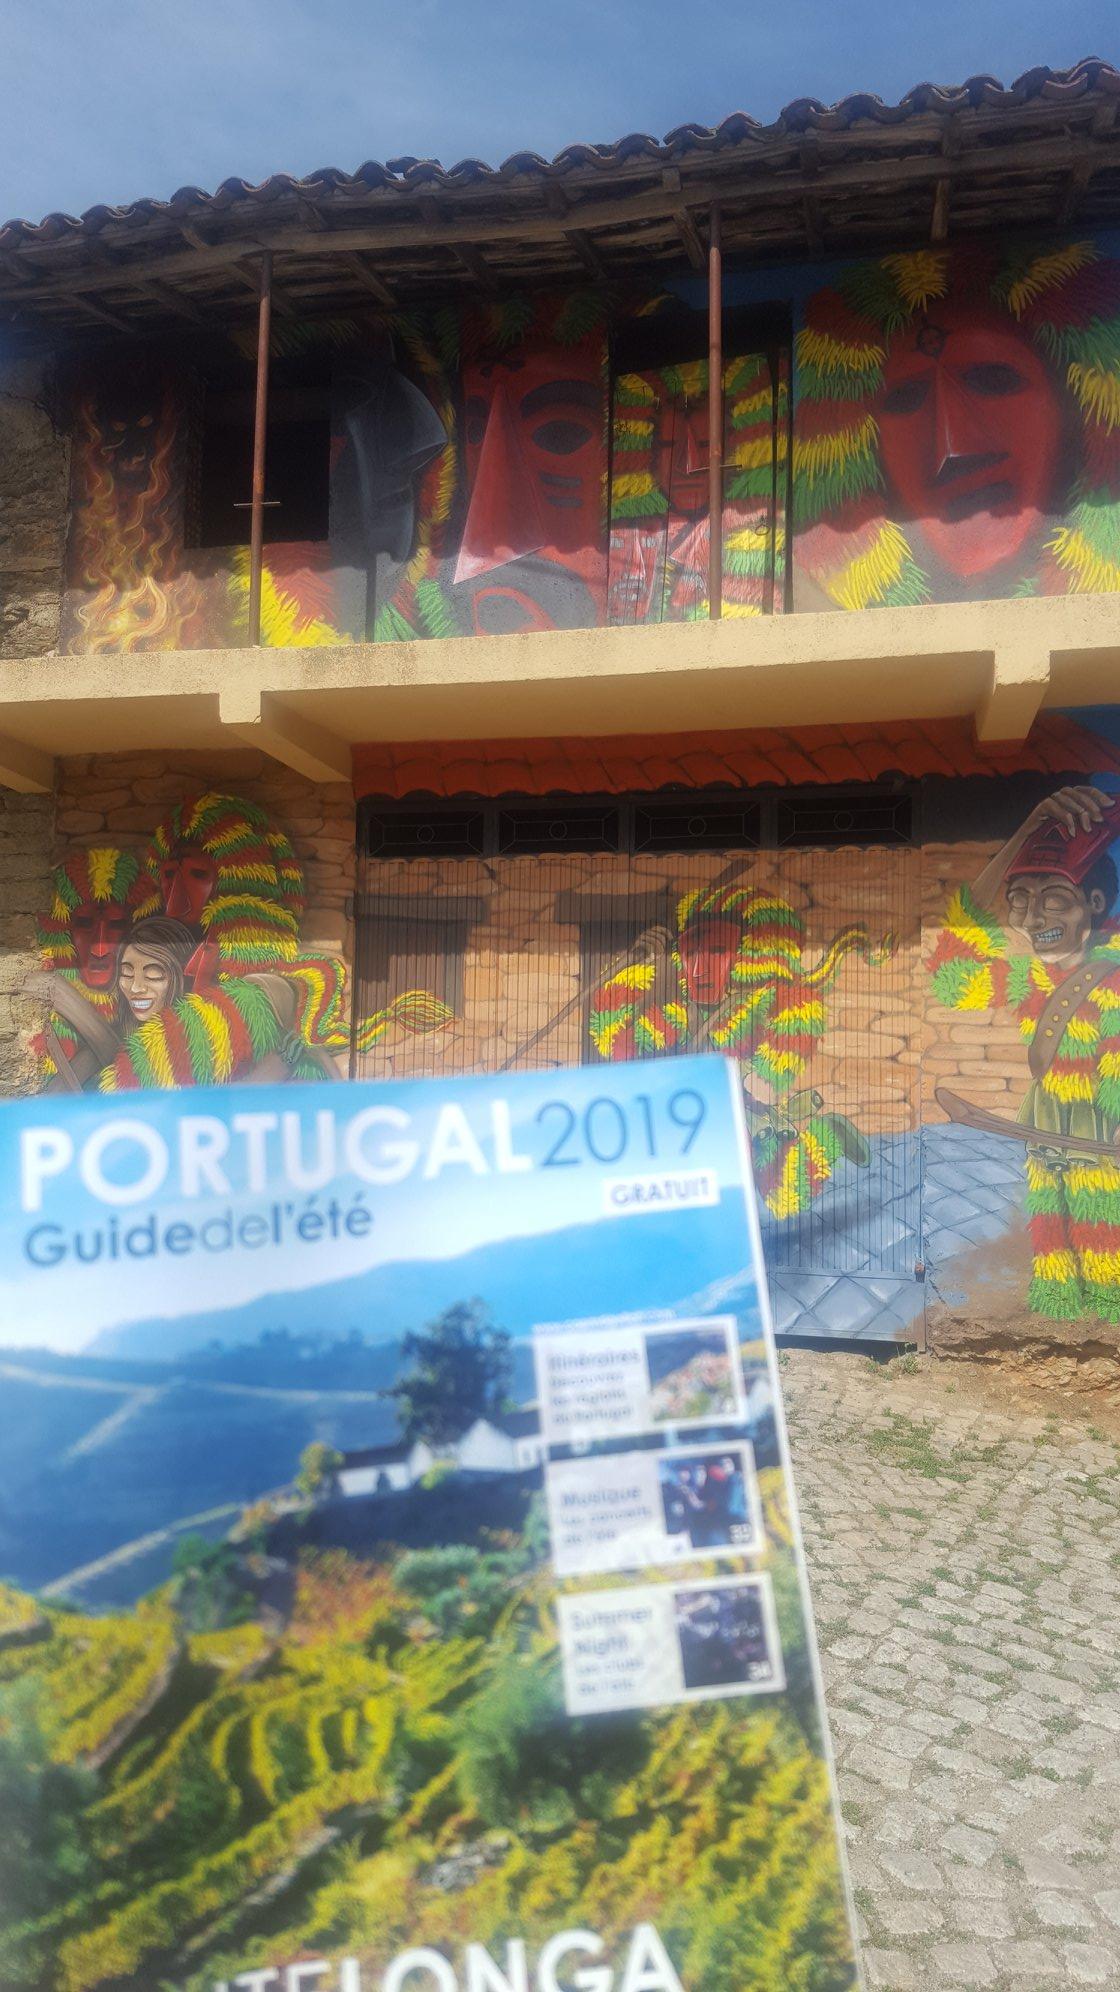 Visite du museu dos Caretos, à Podence, le 10 aout 2019